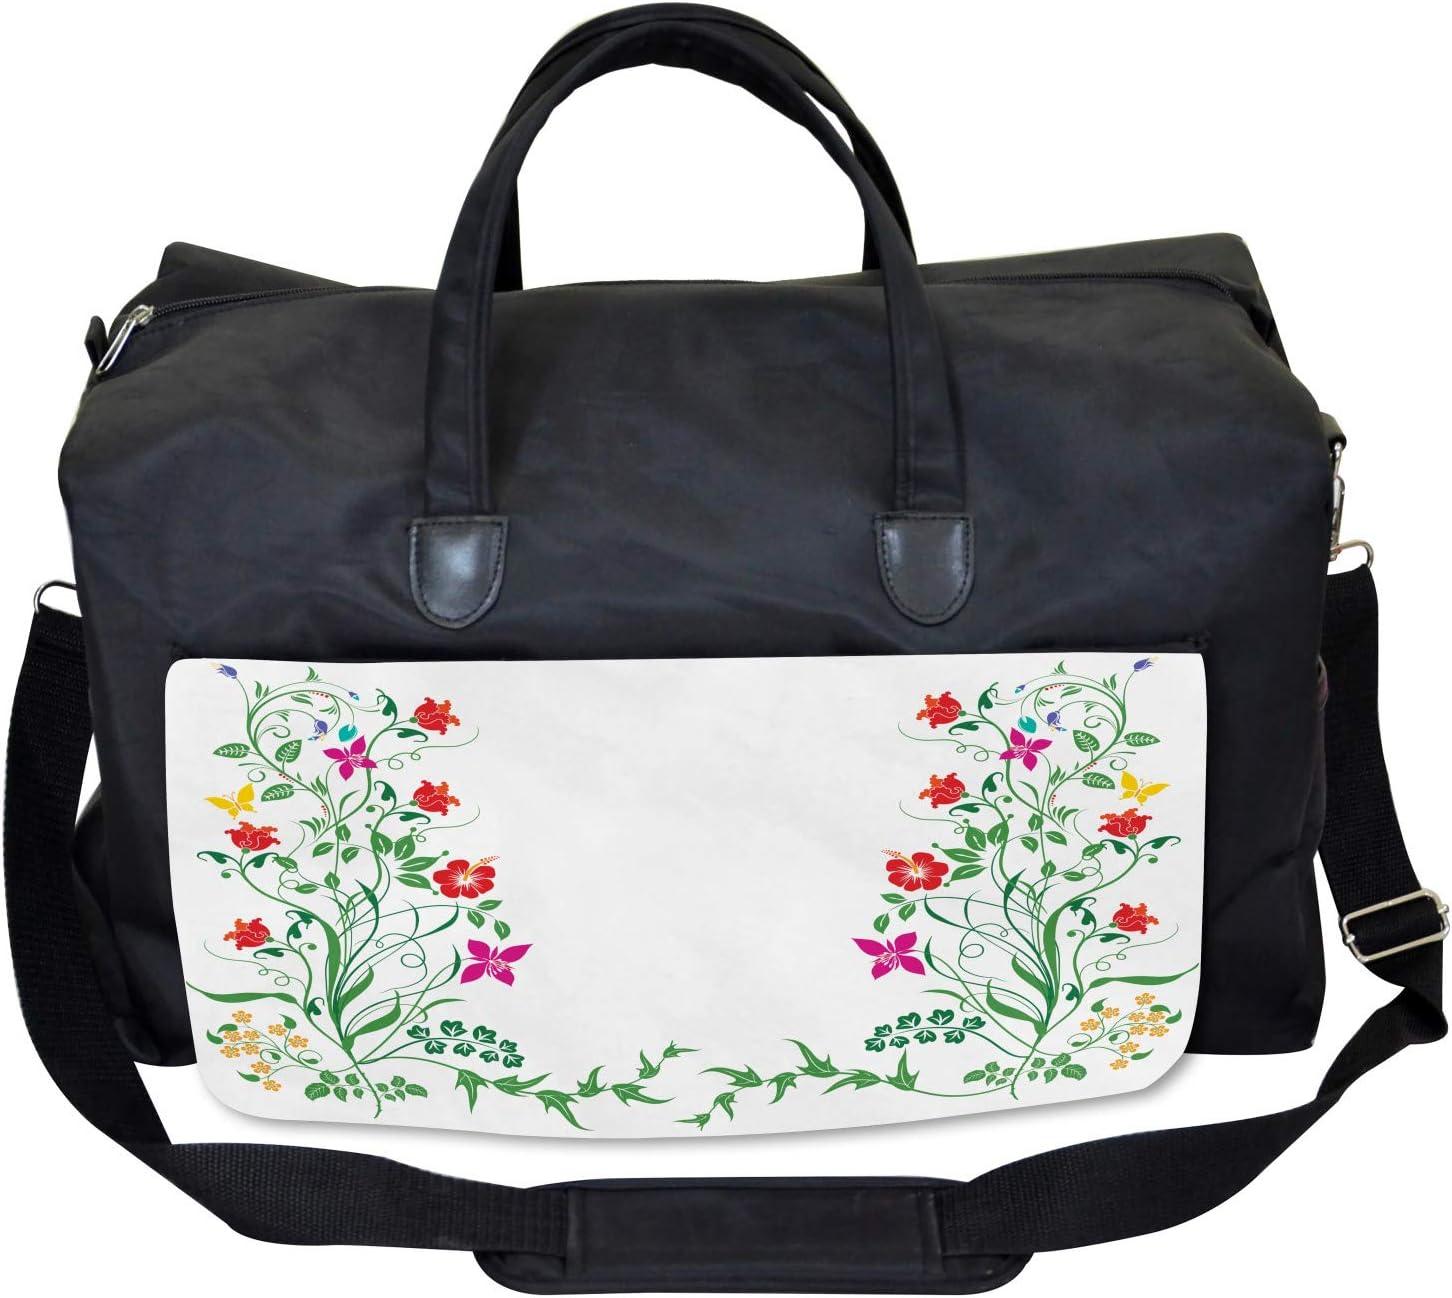 Ambesonne Flower Gym Bag Large Weekender Carry-on Floral Leaves Buds Ivy